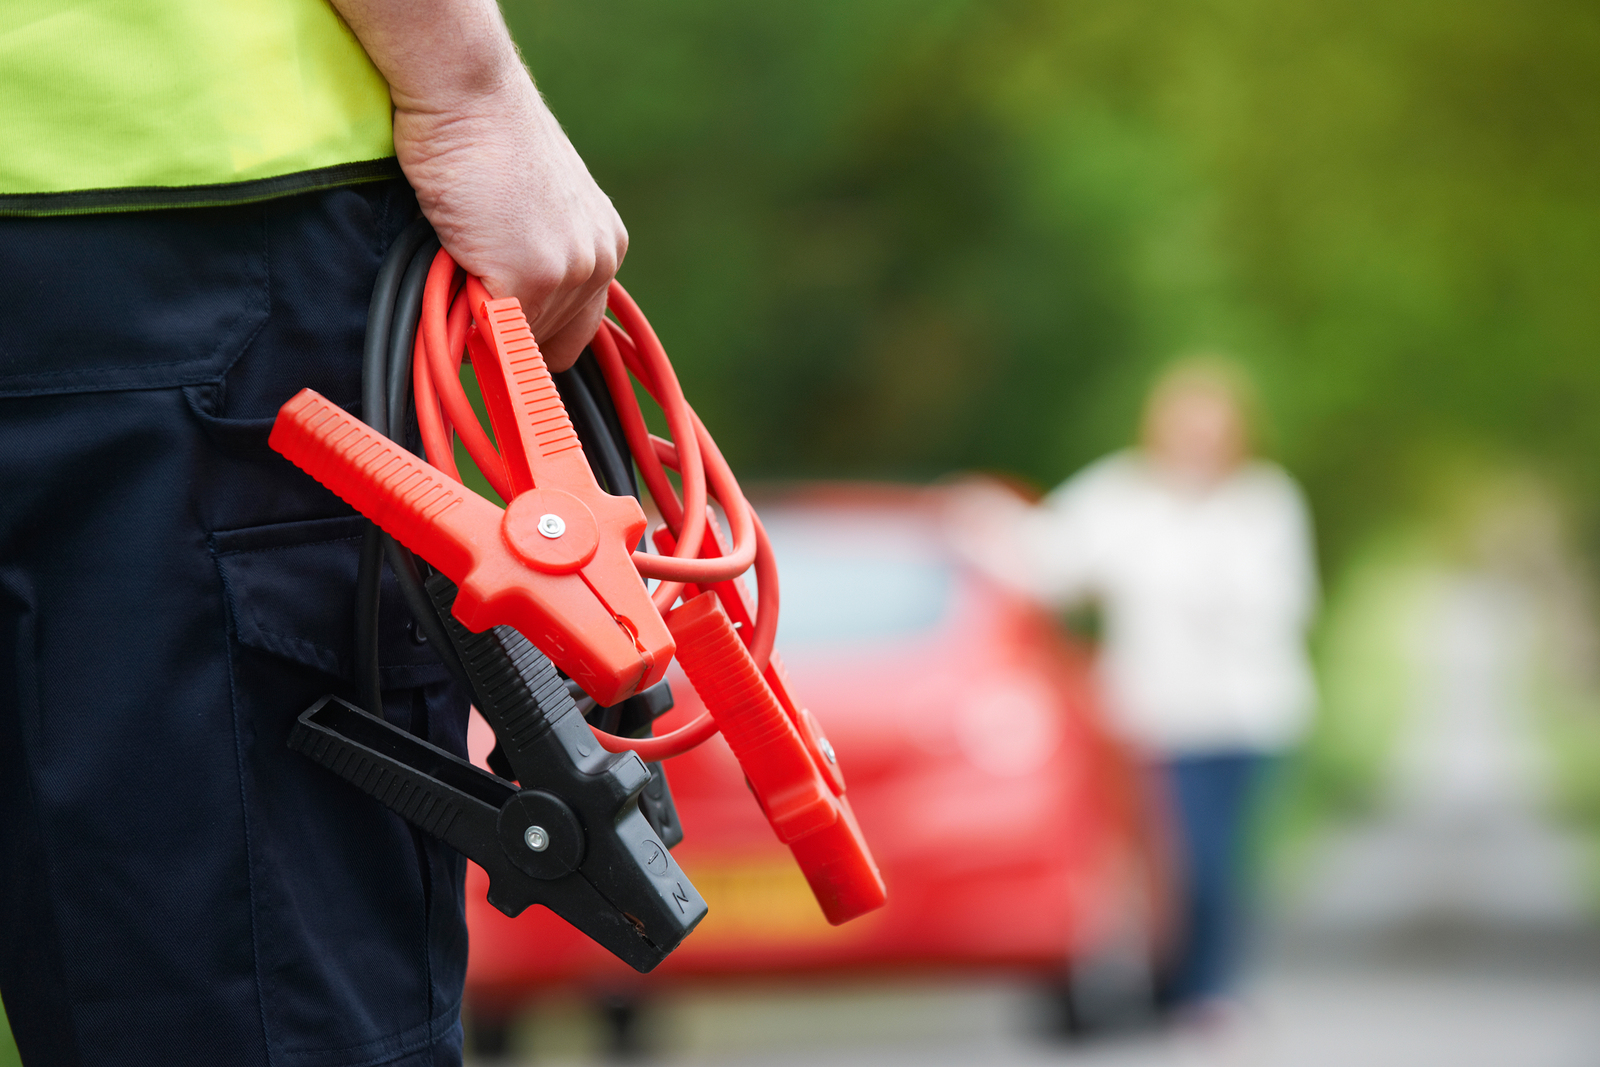 Jumping Your Car Battery - Towing Company vs Good Samaritan